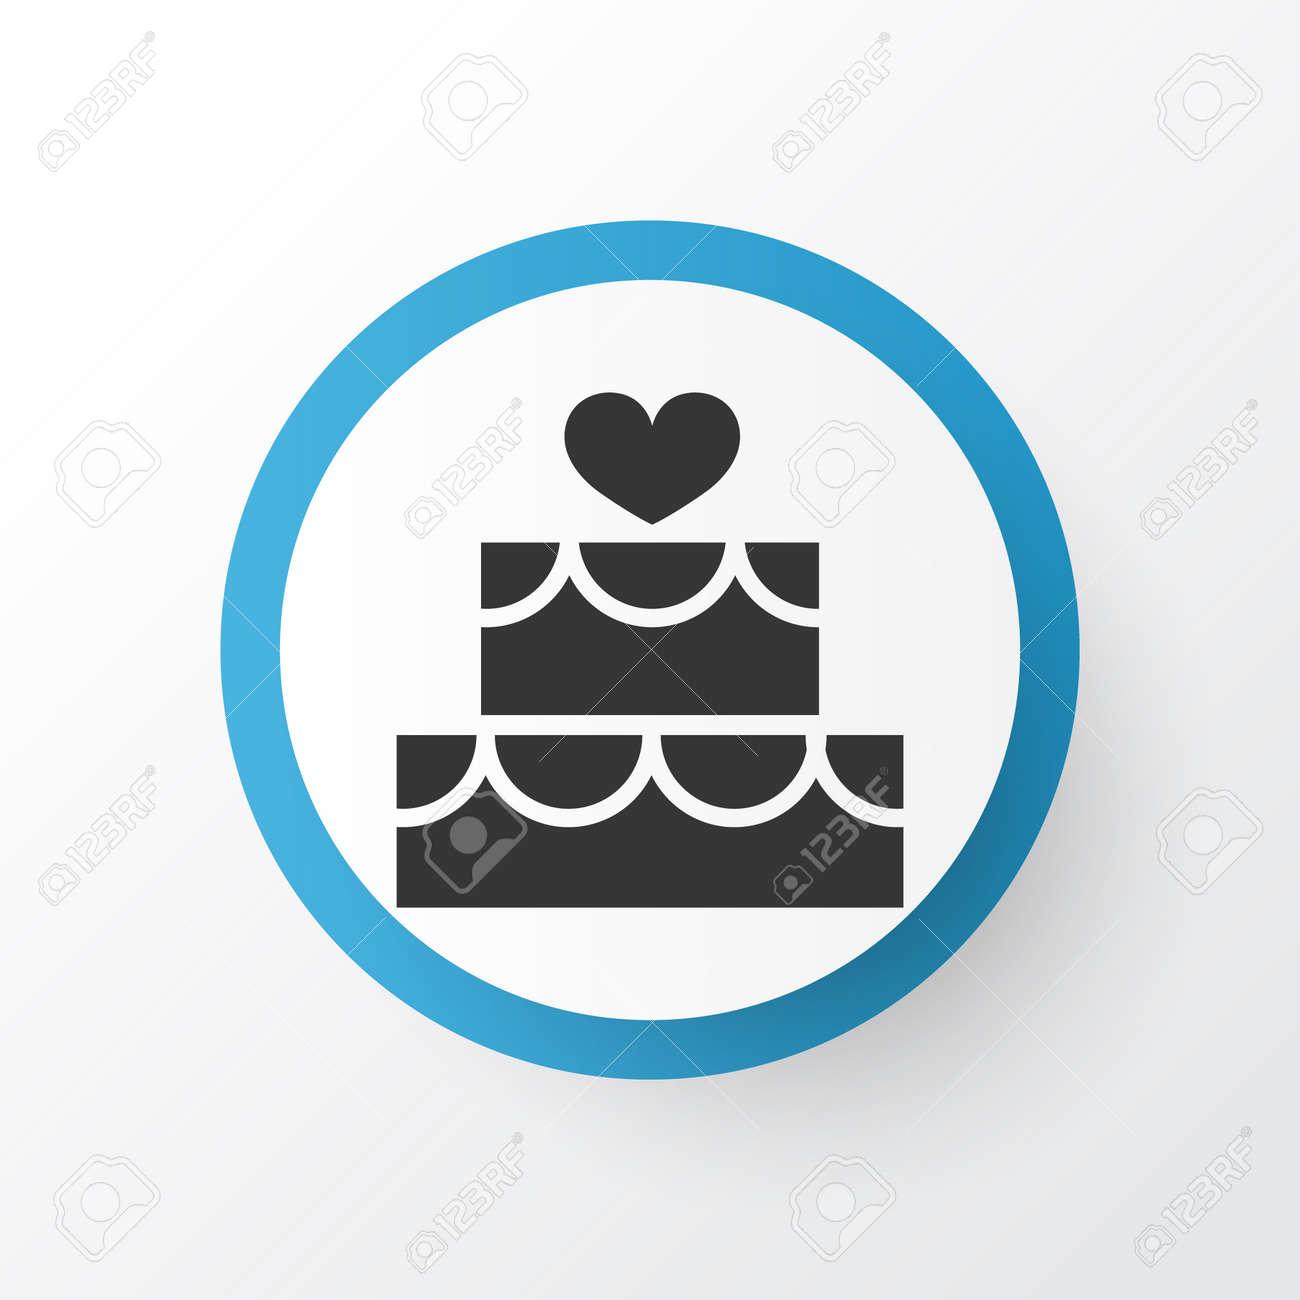 Premium quality isolated pastry element in trendy style cake premium quality isolated pastry element in trendy style cake icon symbol stock vector buycottarizona